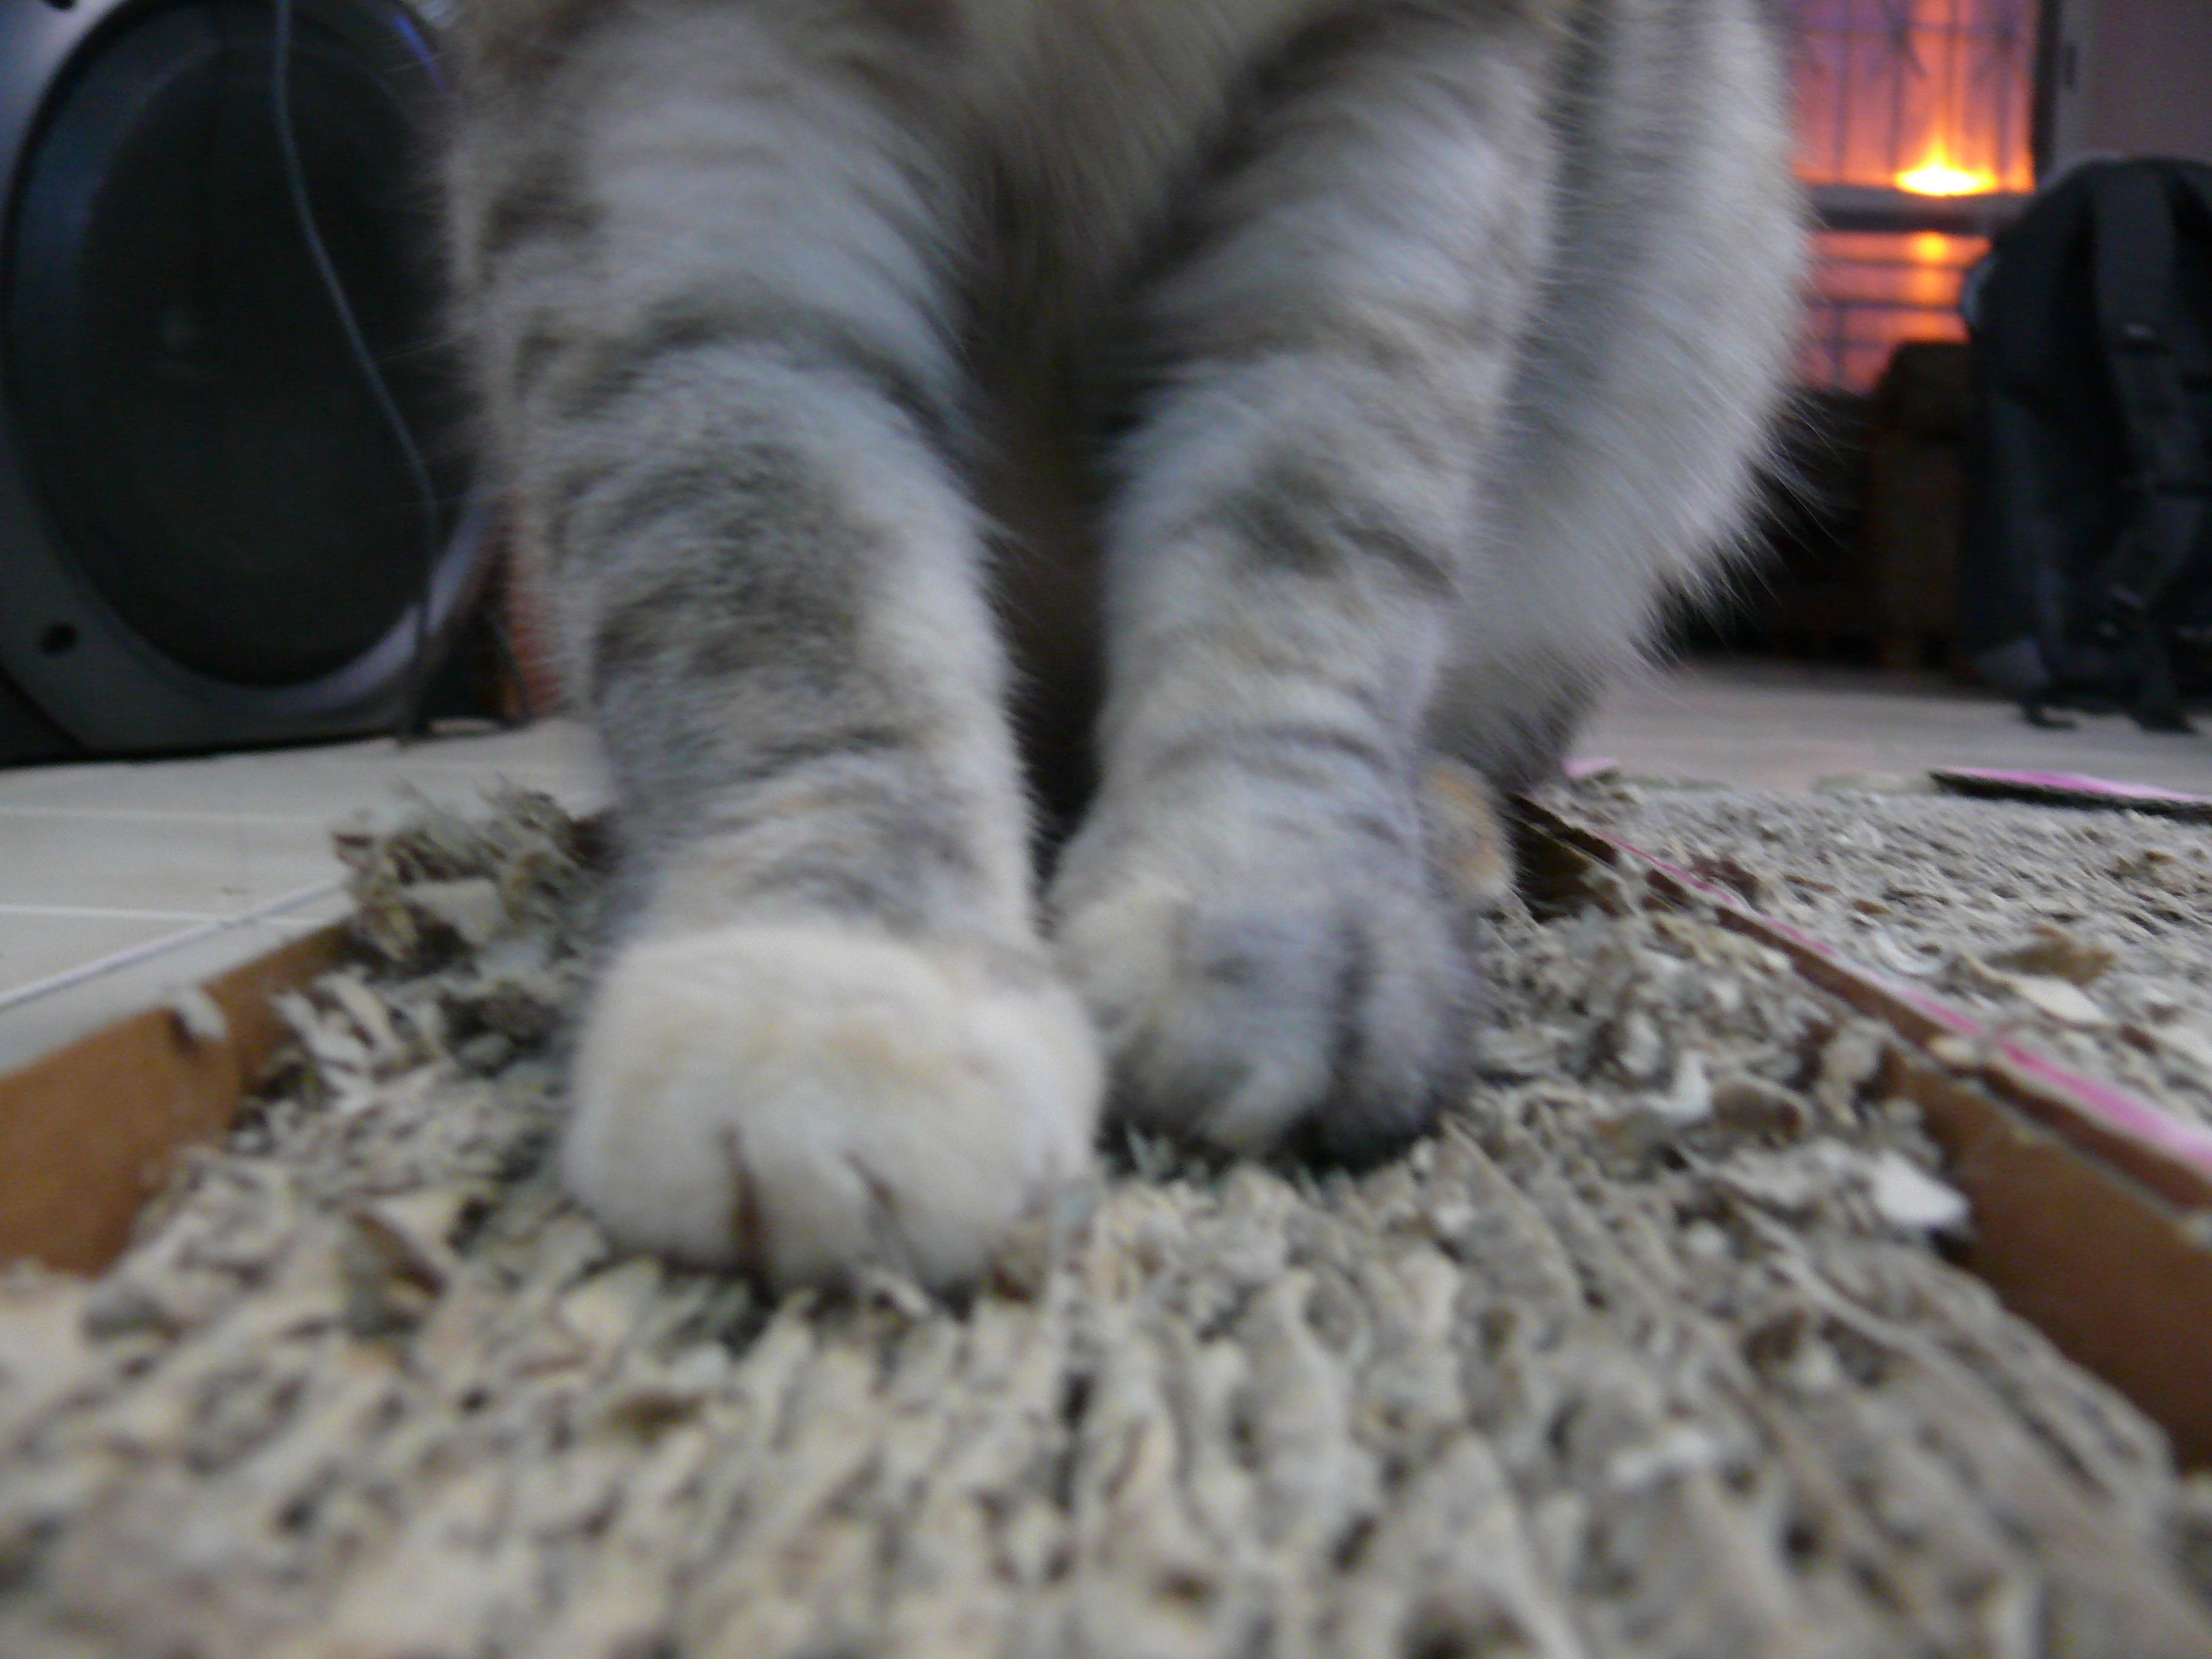 http://upload.wikimedia.org/wikipedia/commons/7/76/Corrugated_fiberboard_scratch_pad_with_cat.jpg